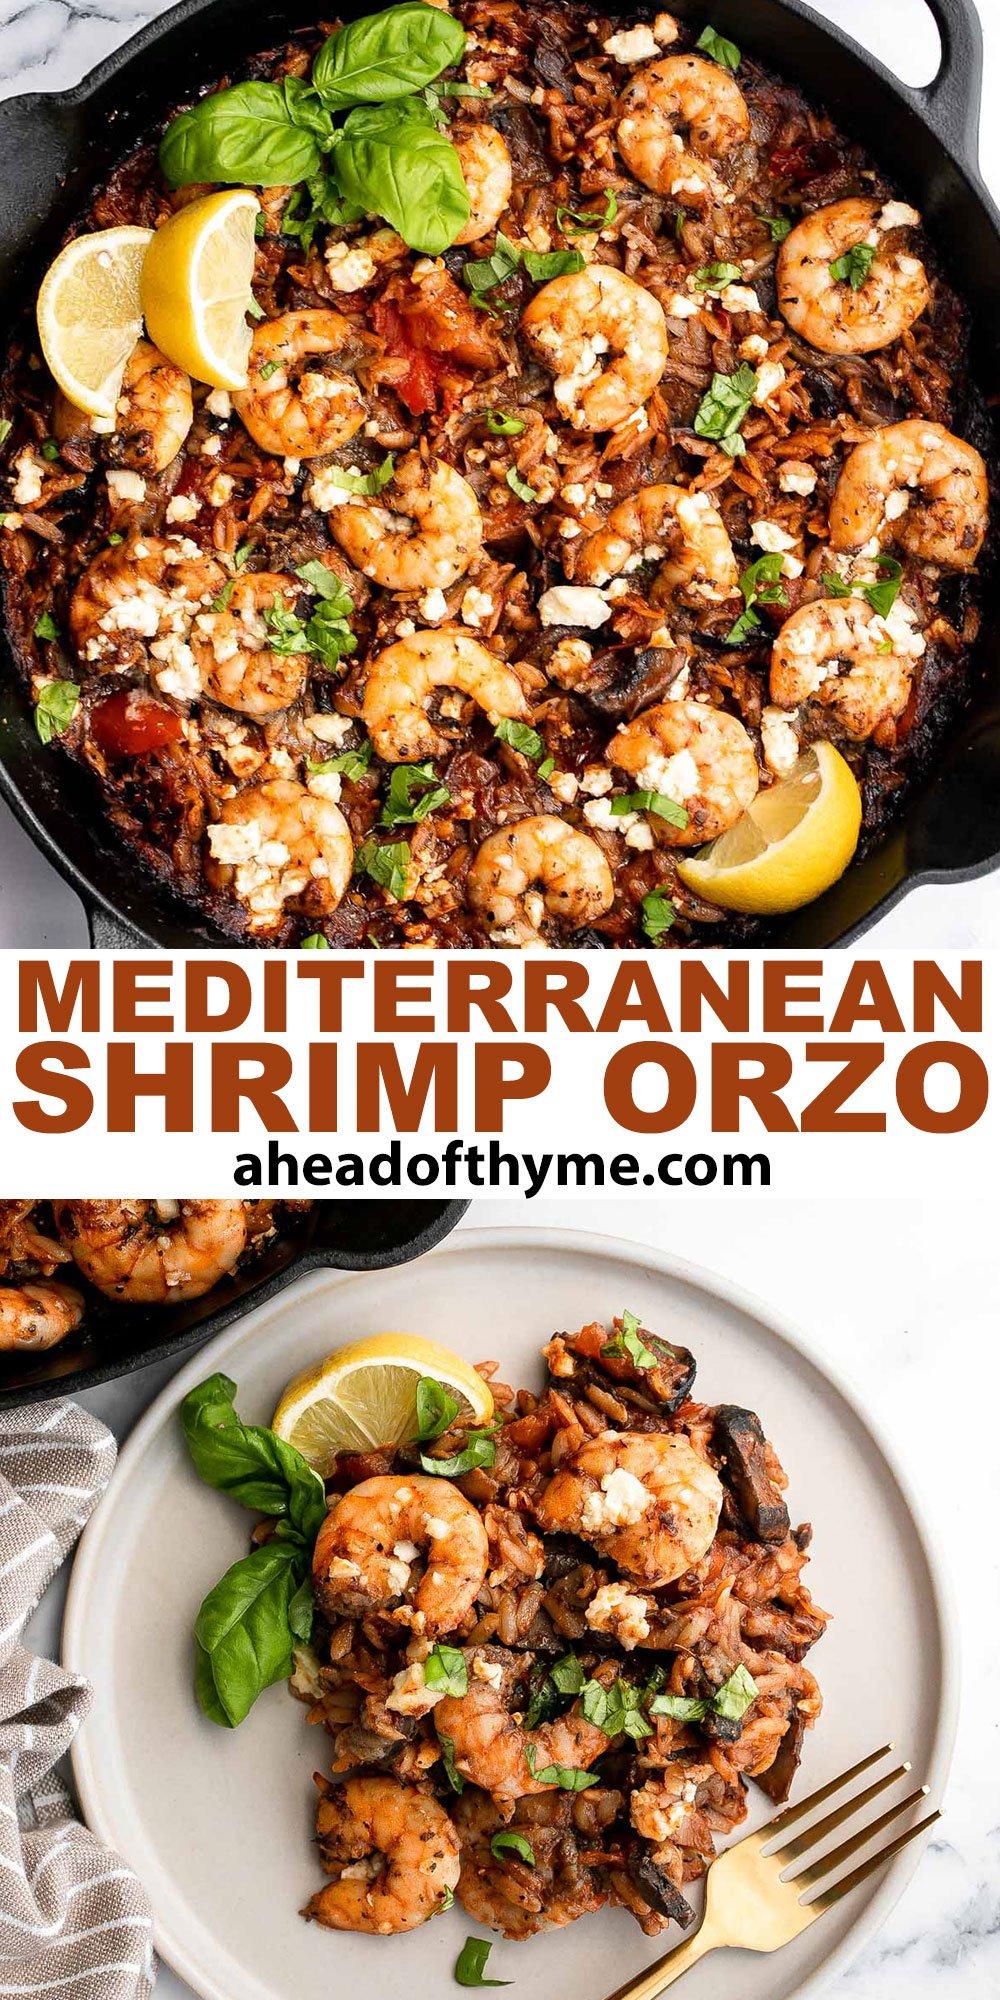 Mediterranean Baked Shrimp Orzo